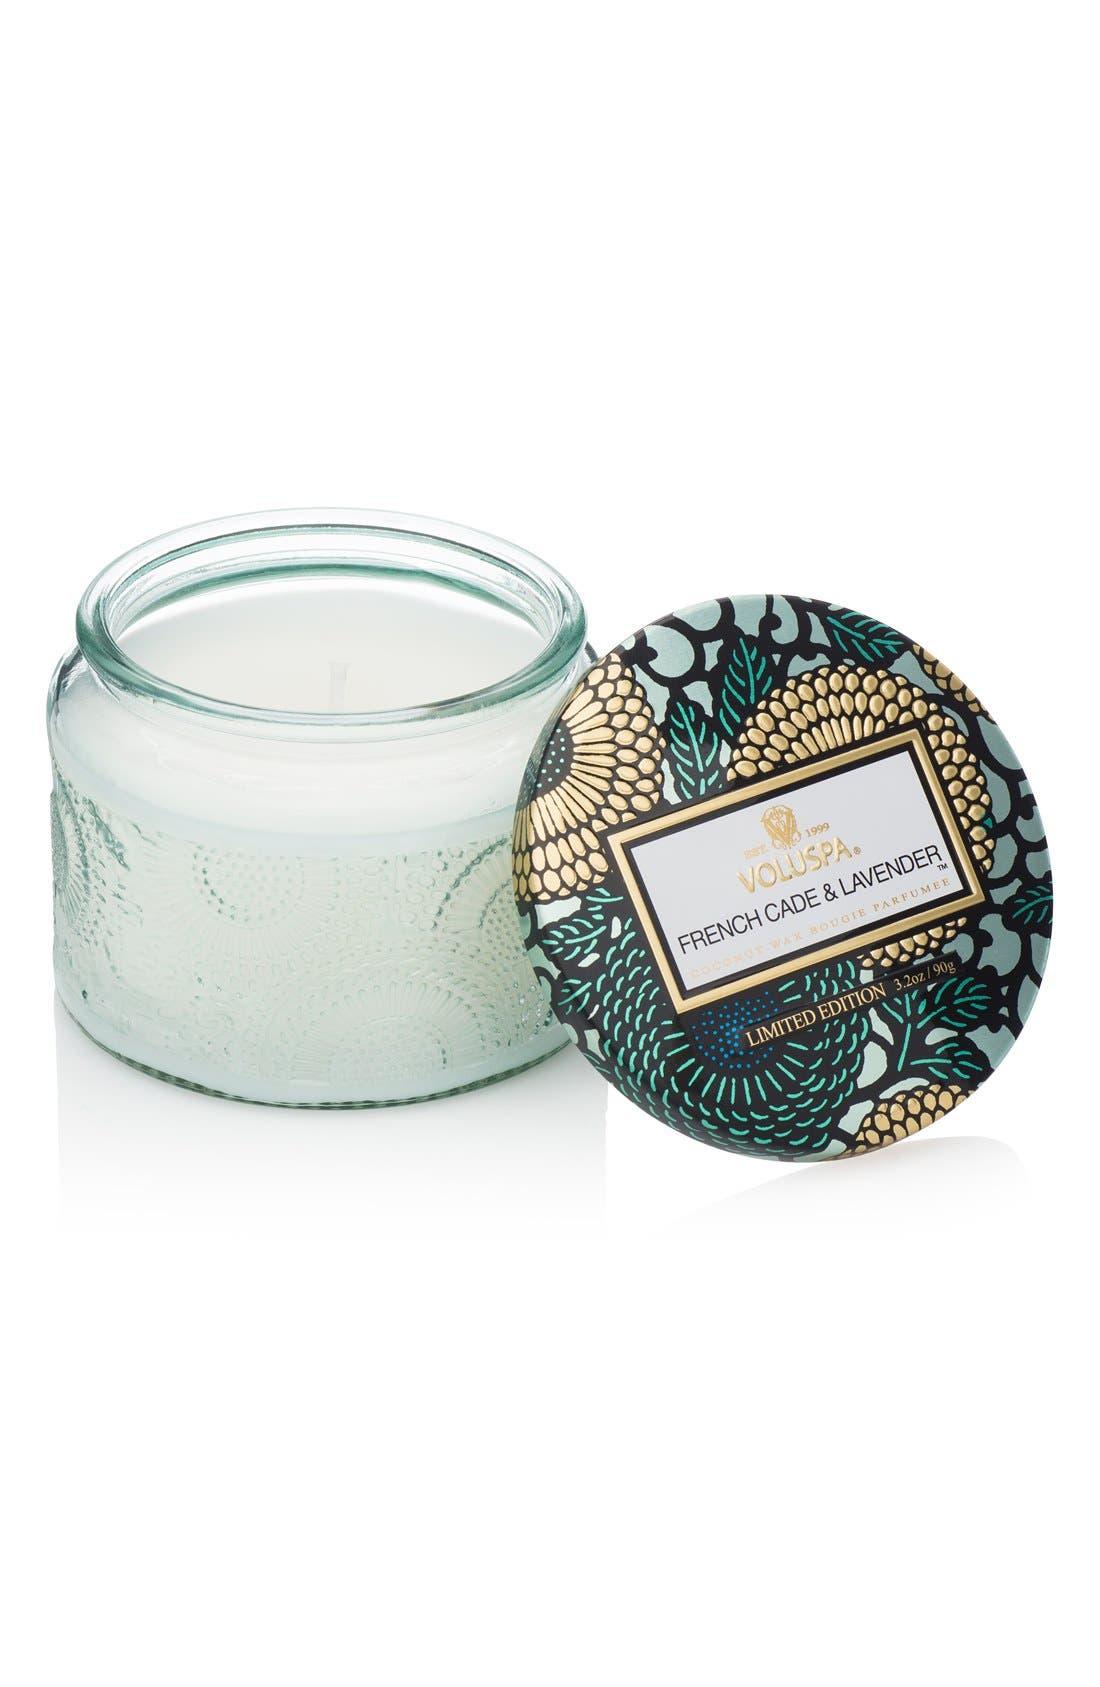 Voluspa Japonica French Cade Lavender Petite Colored Jar Candle